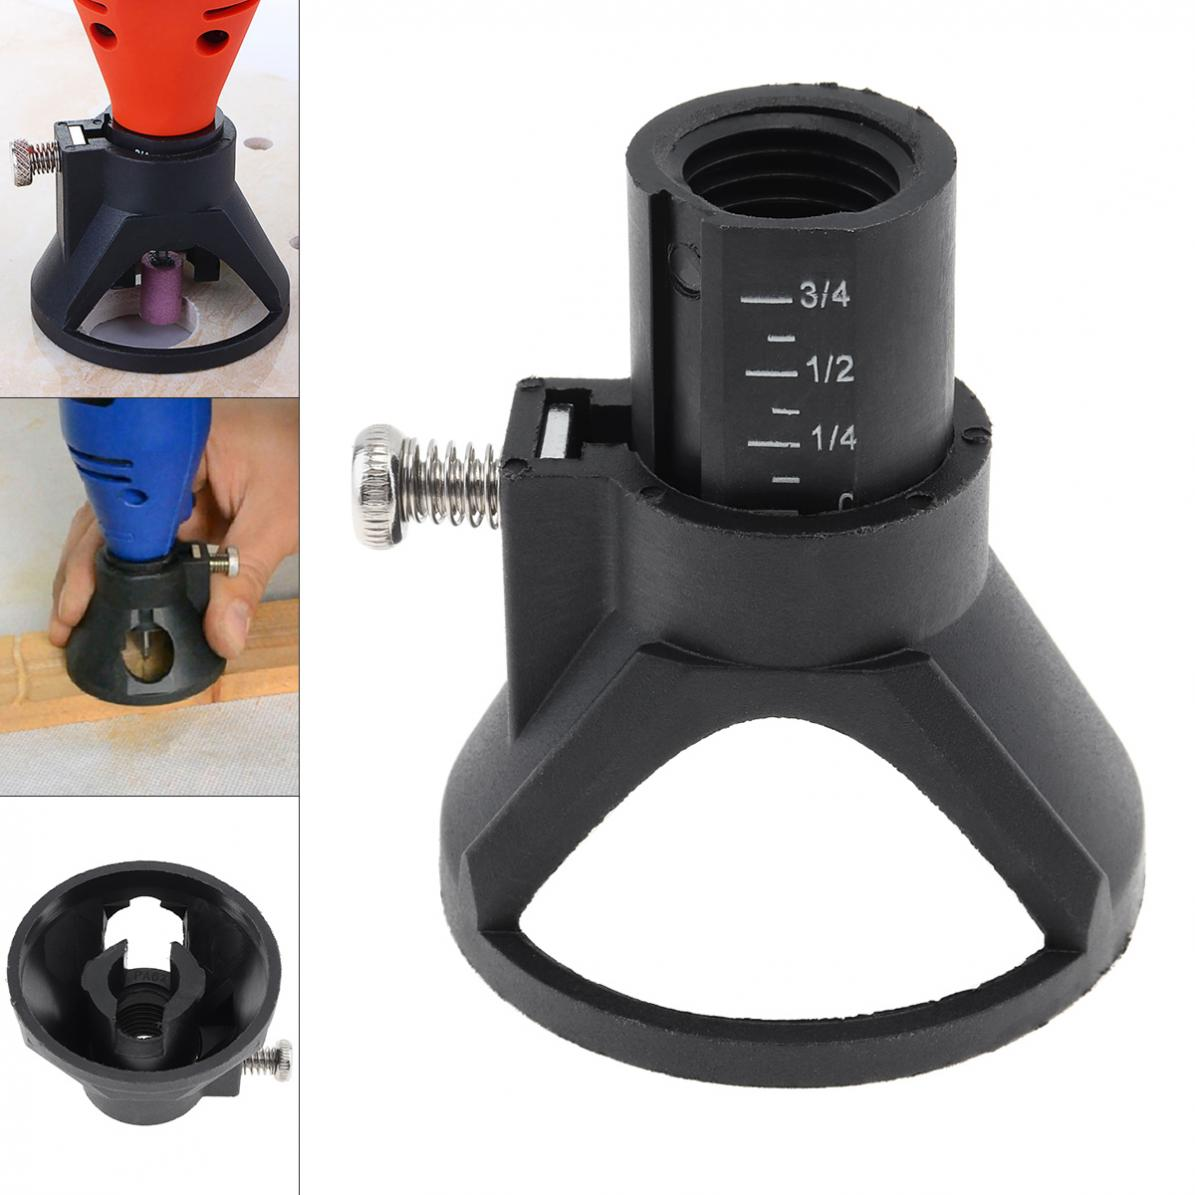 68x60mm مکان یابی اختصاصی شاخ مناسب برای دریل دریل چرخش چرخ دستی ابزار لوازم جانبی مته اختصاصی یاب